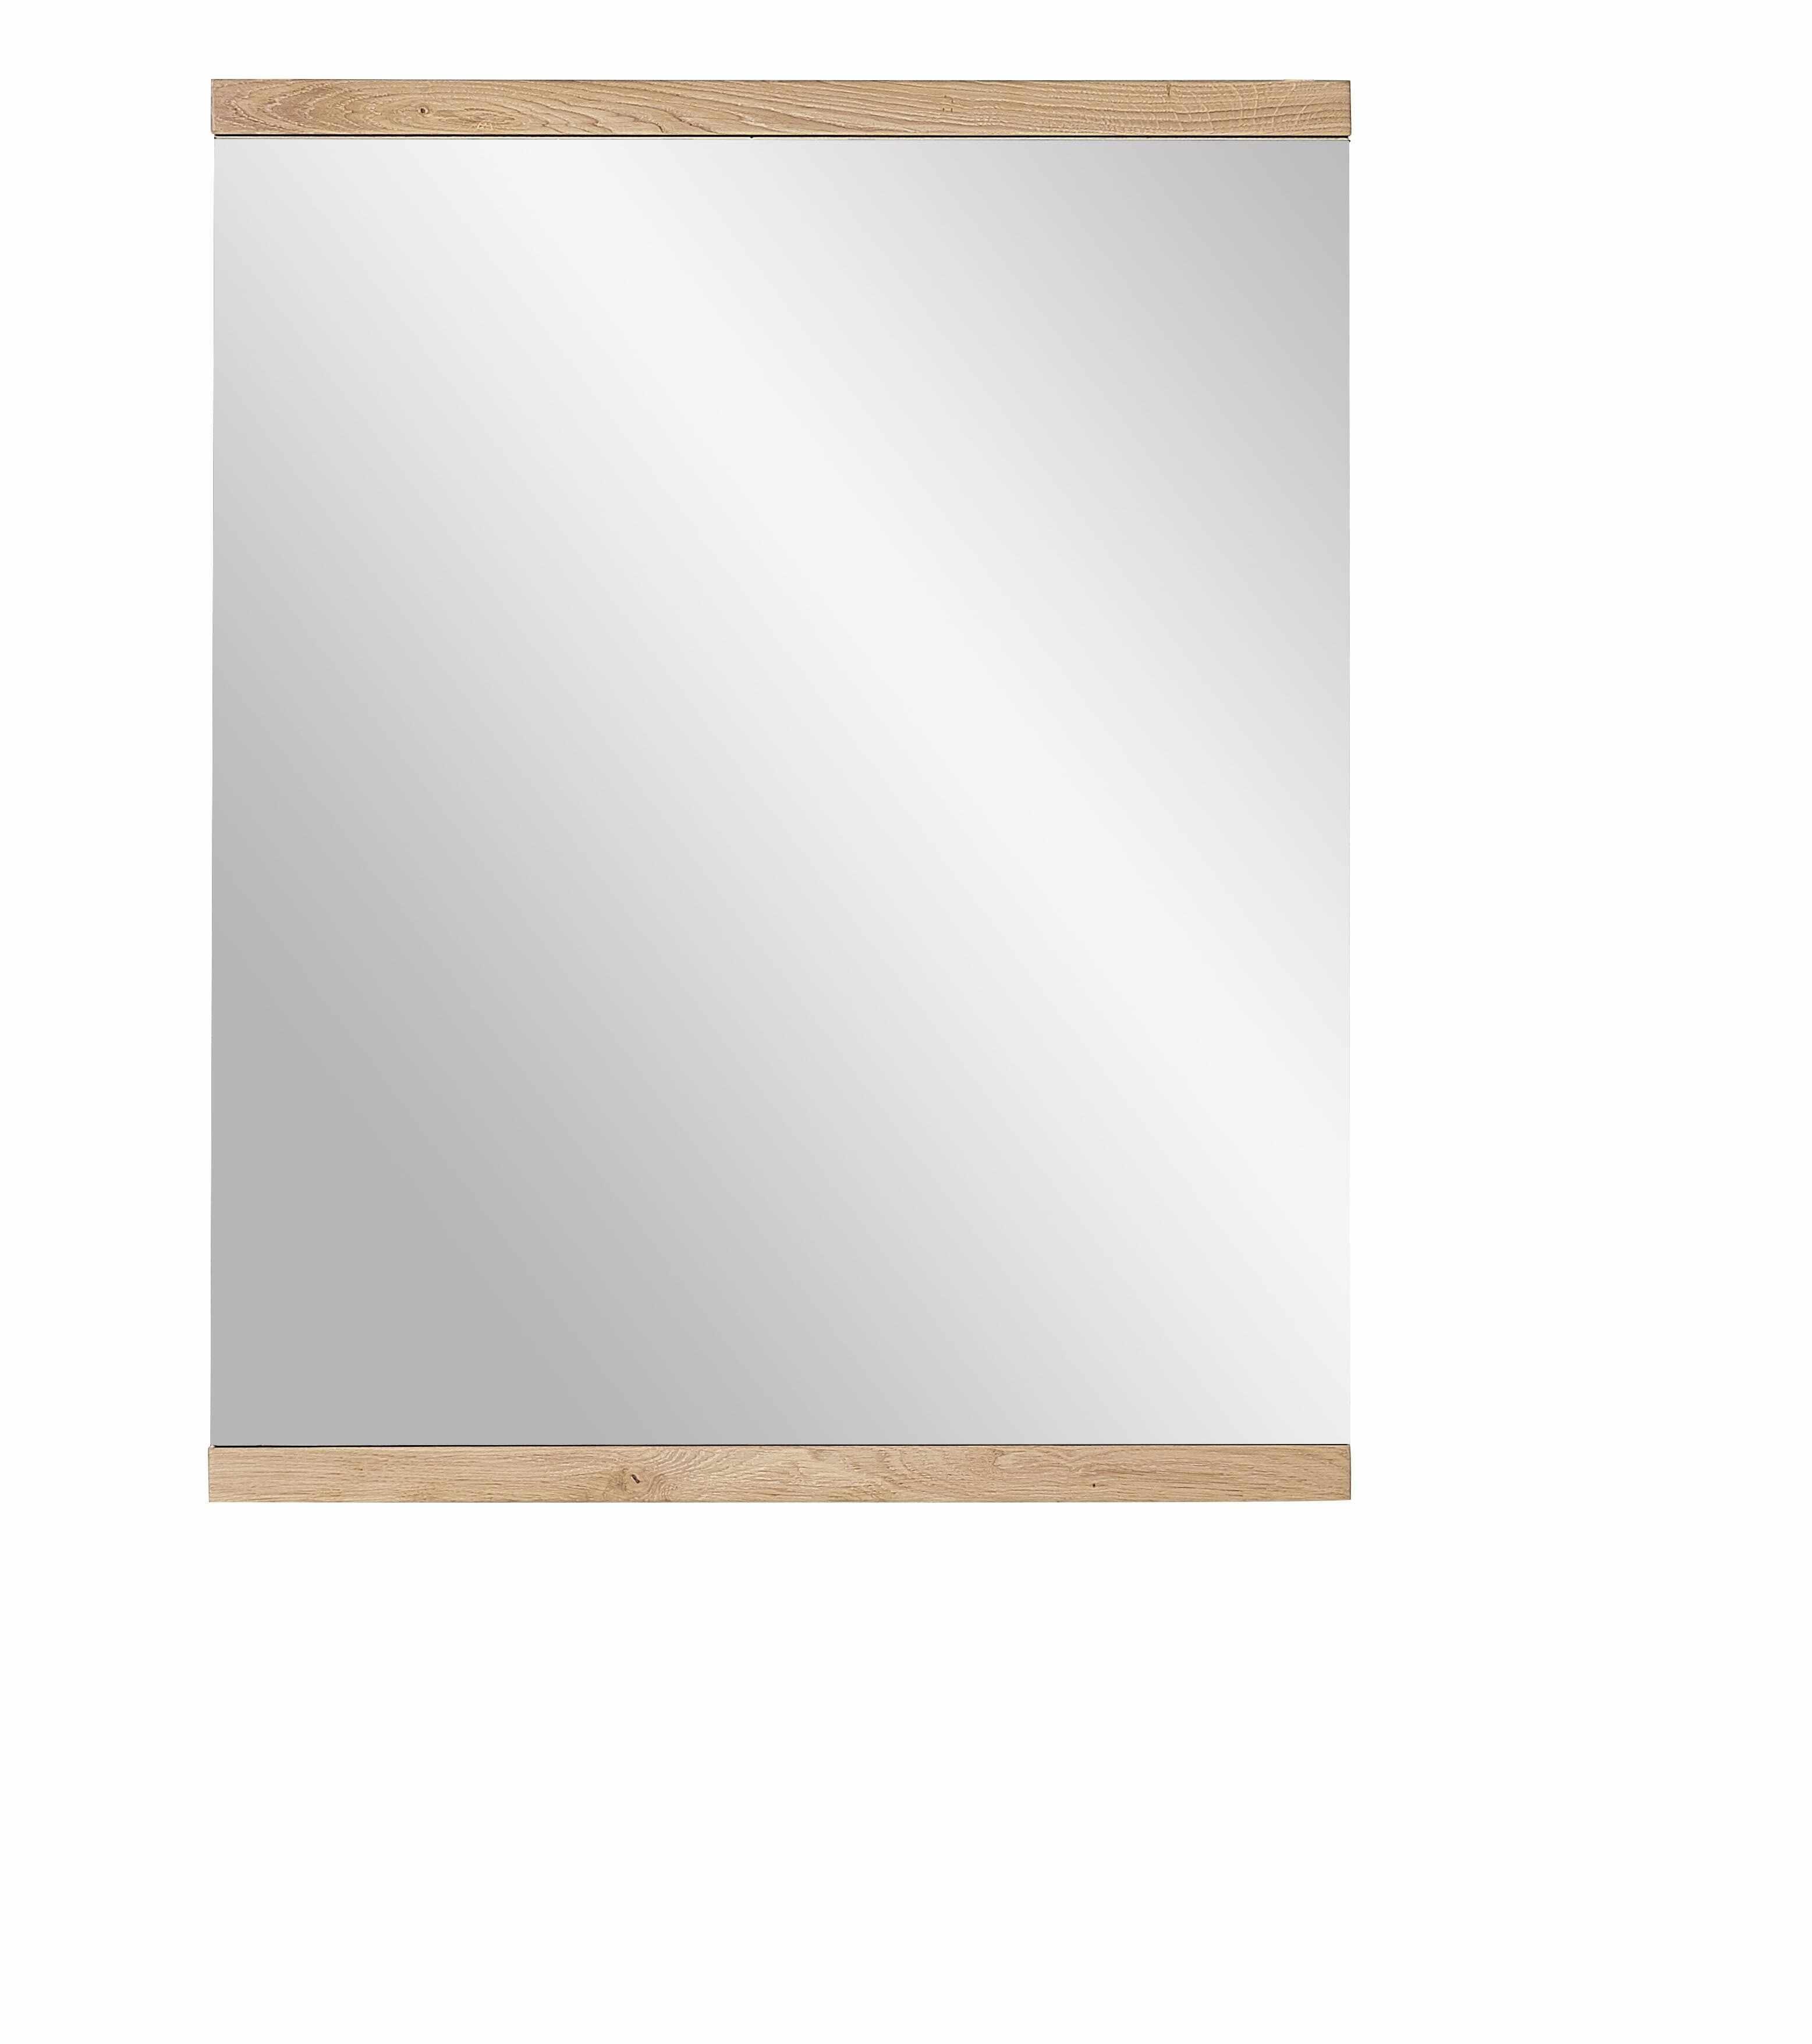 Oglinda din furnir si lemn Crispin Natur, l71xH88 cm la pret 671 lei